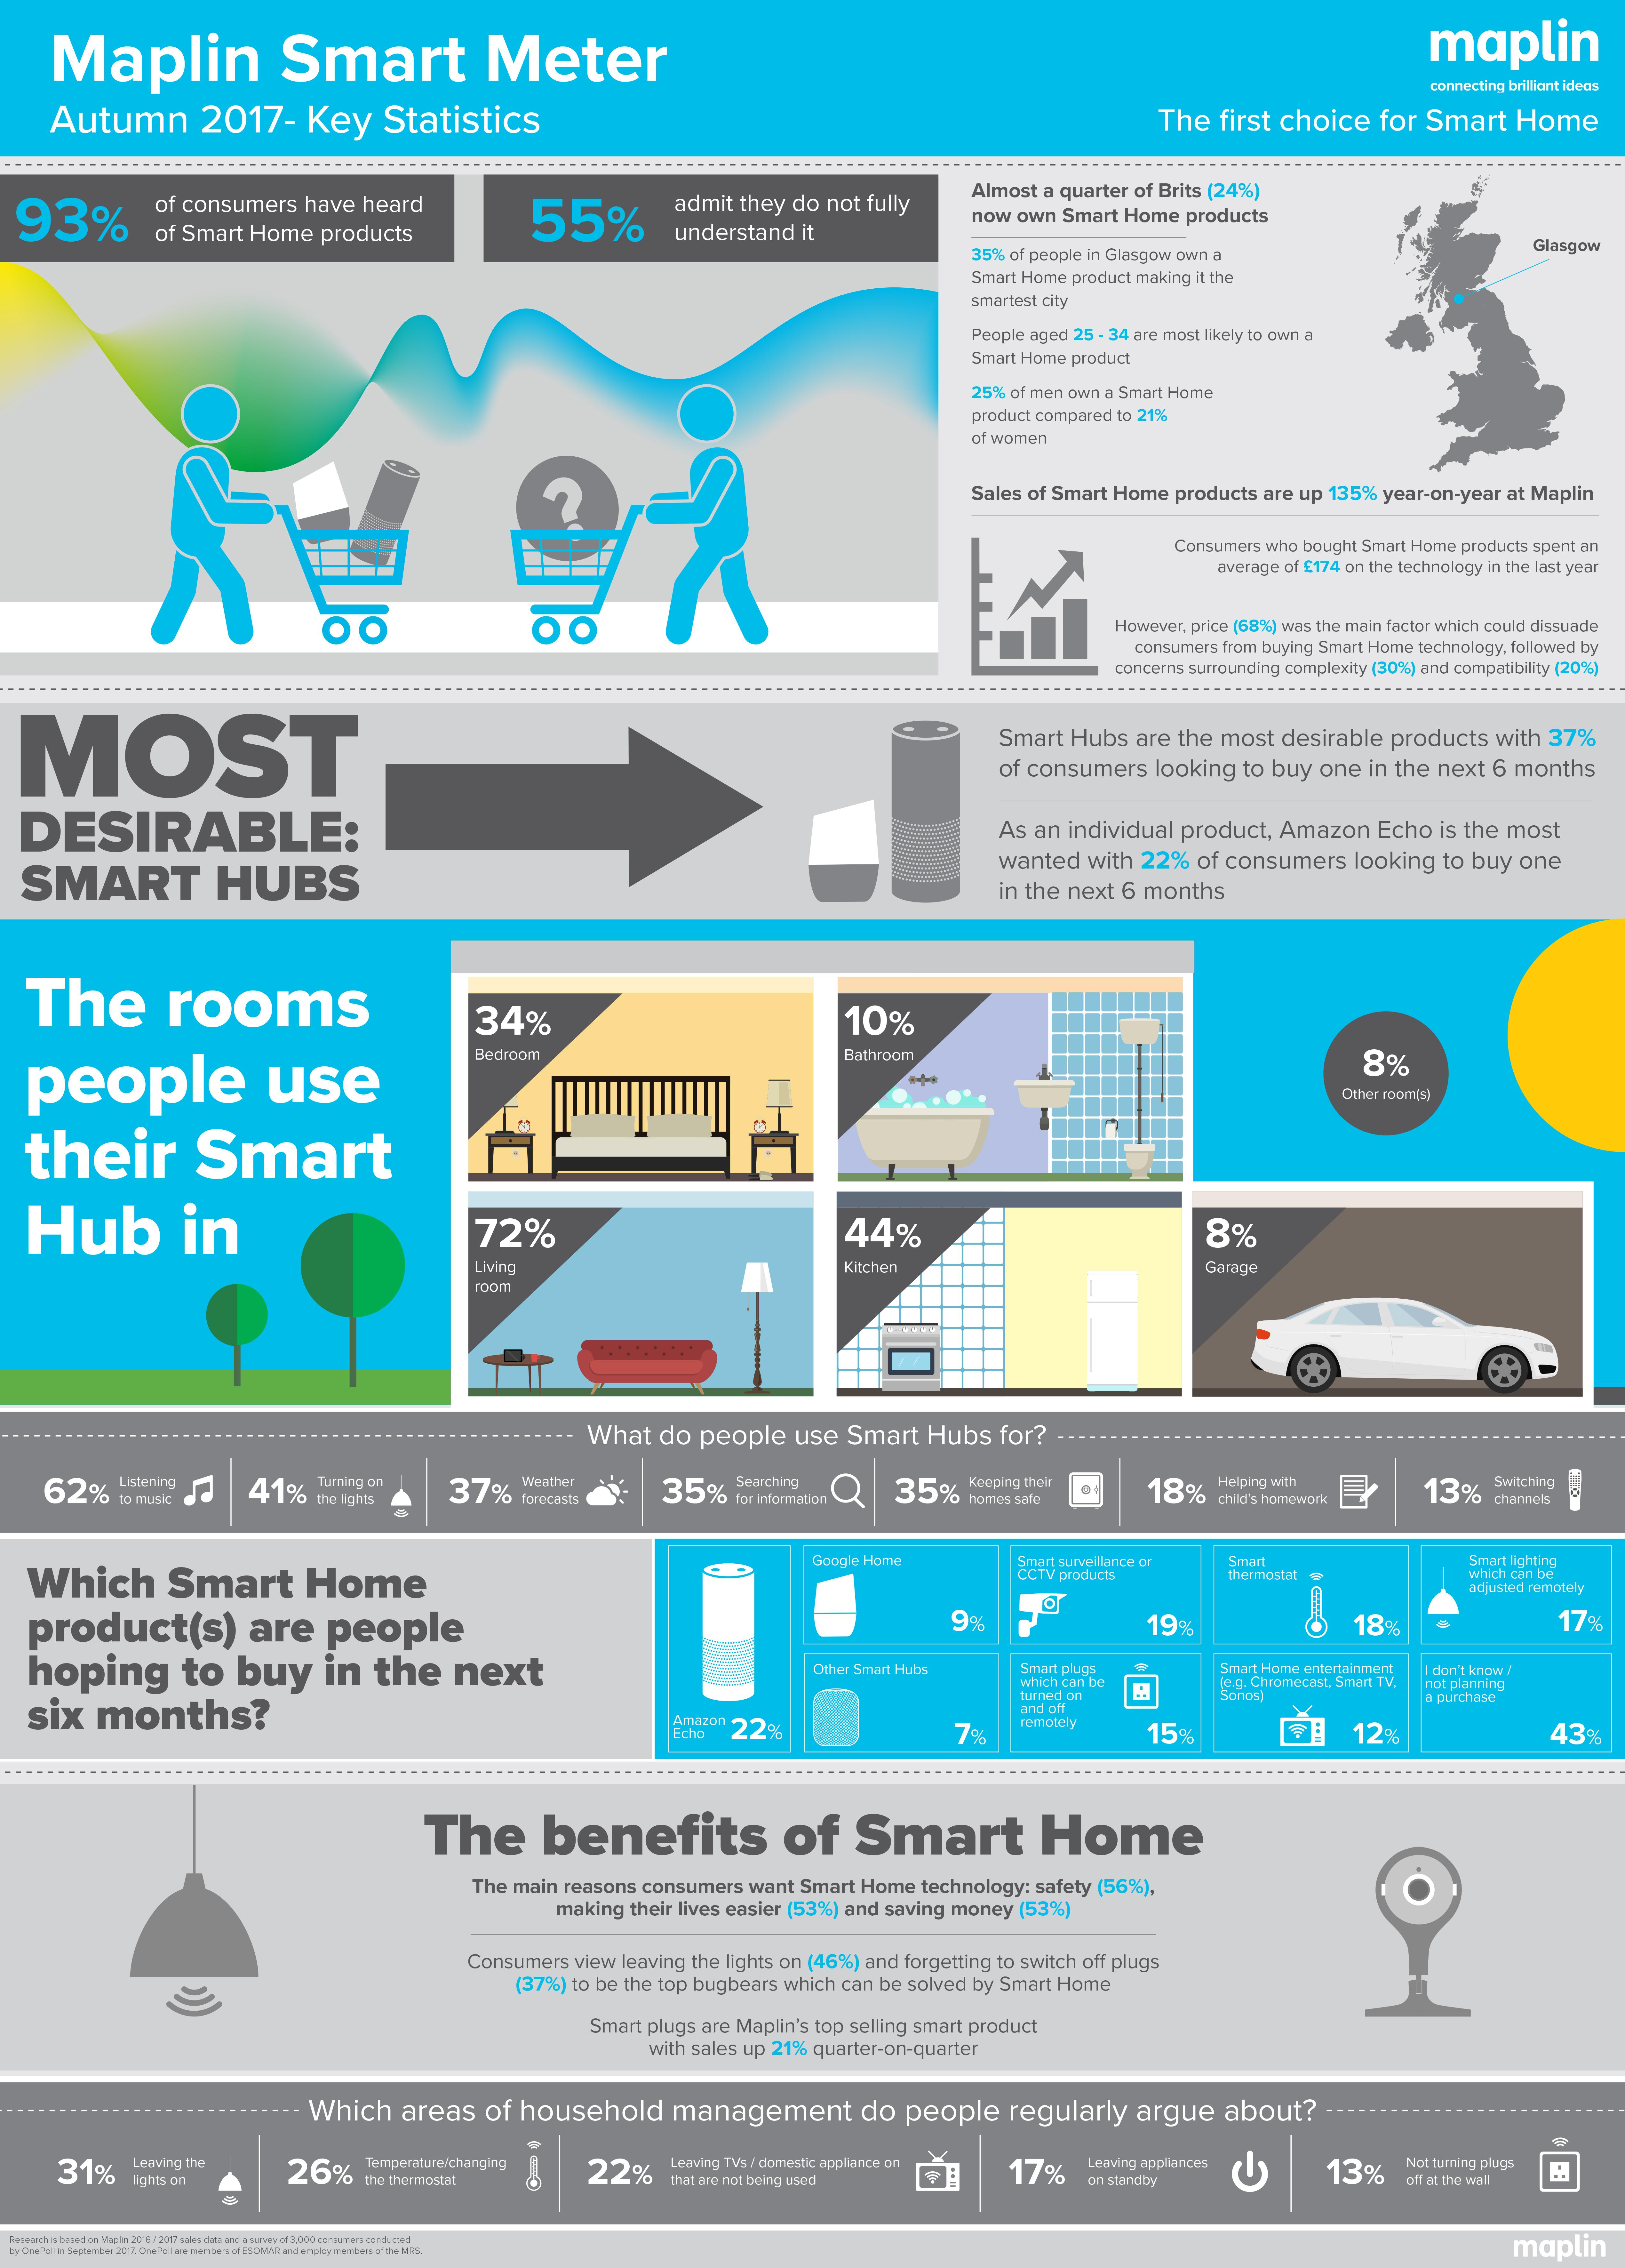 Maplin Smart Meter: Surge in Smart Homes across UK | Business Wire